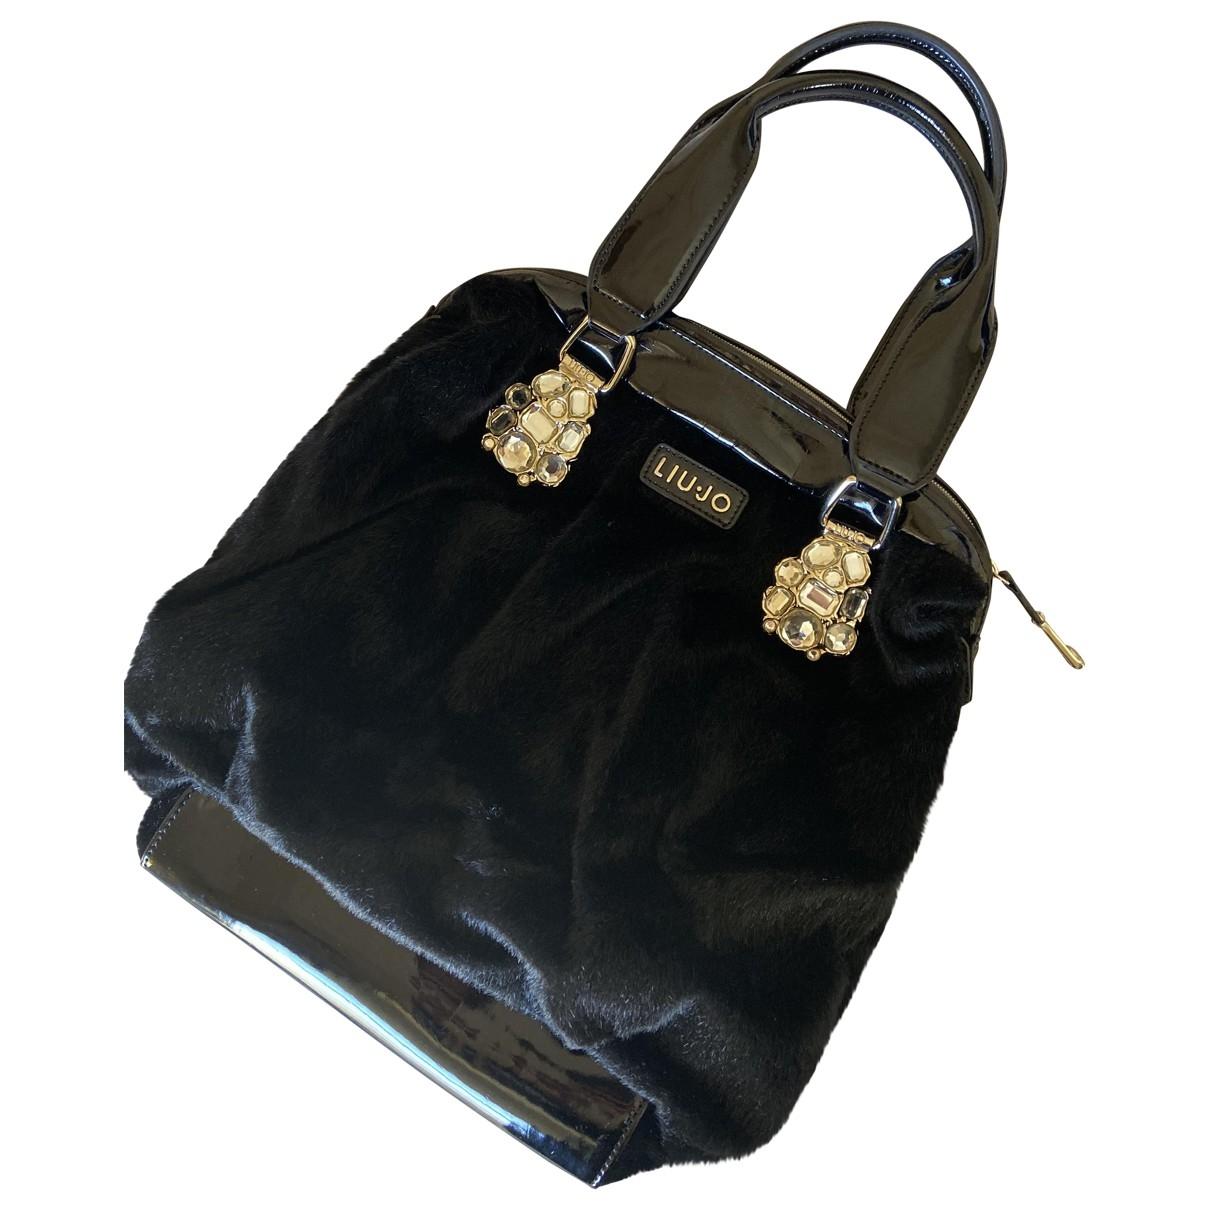 Liu.jo \N Handtasche in  Schwarz Synthetikpelz